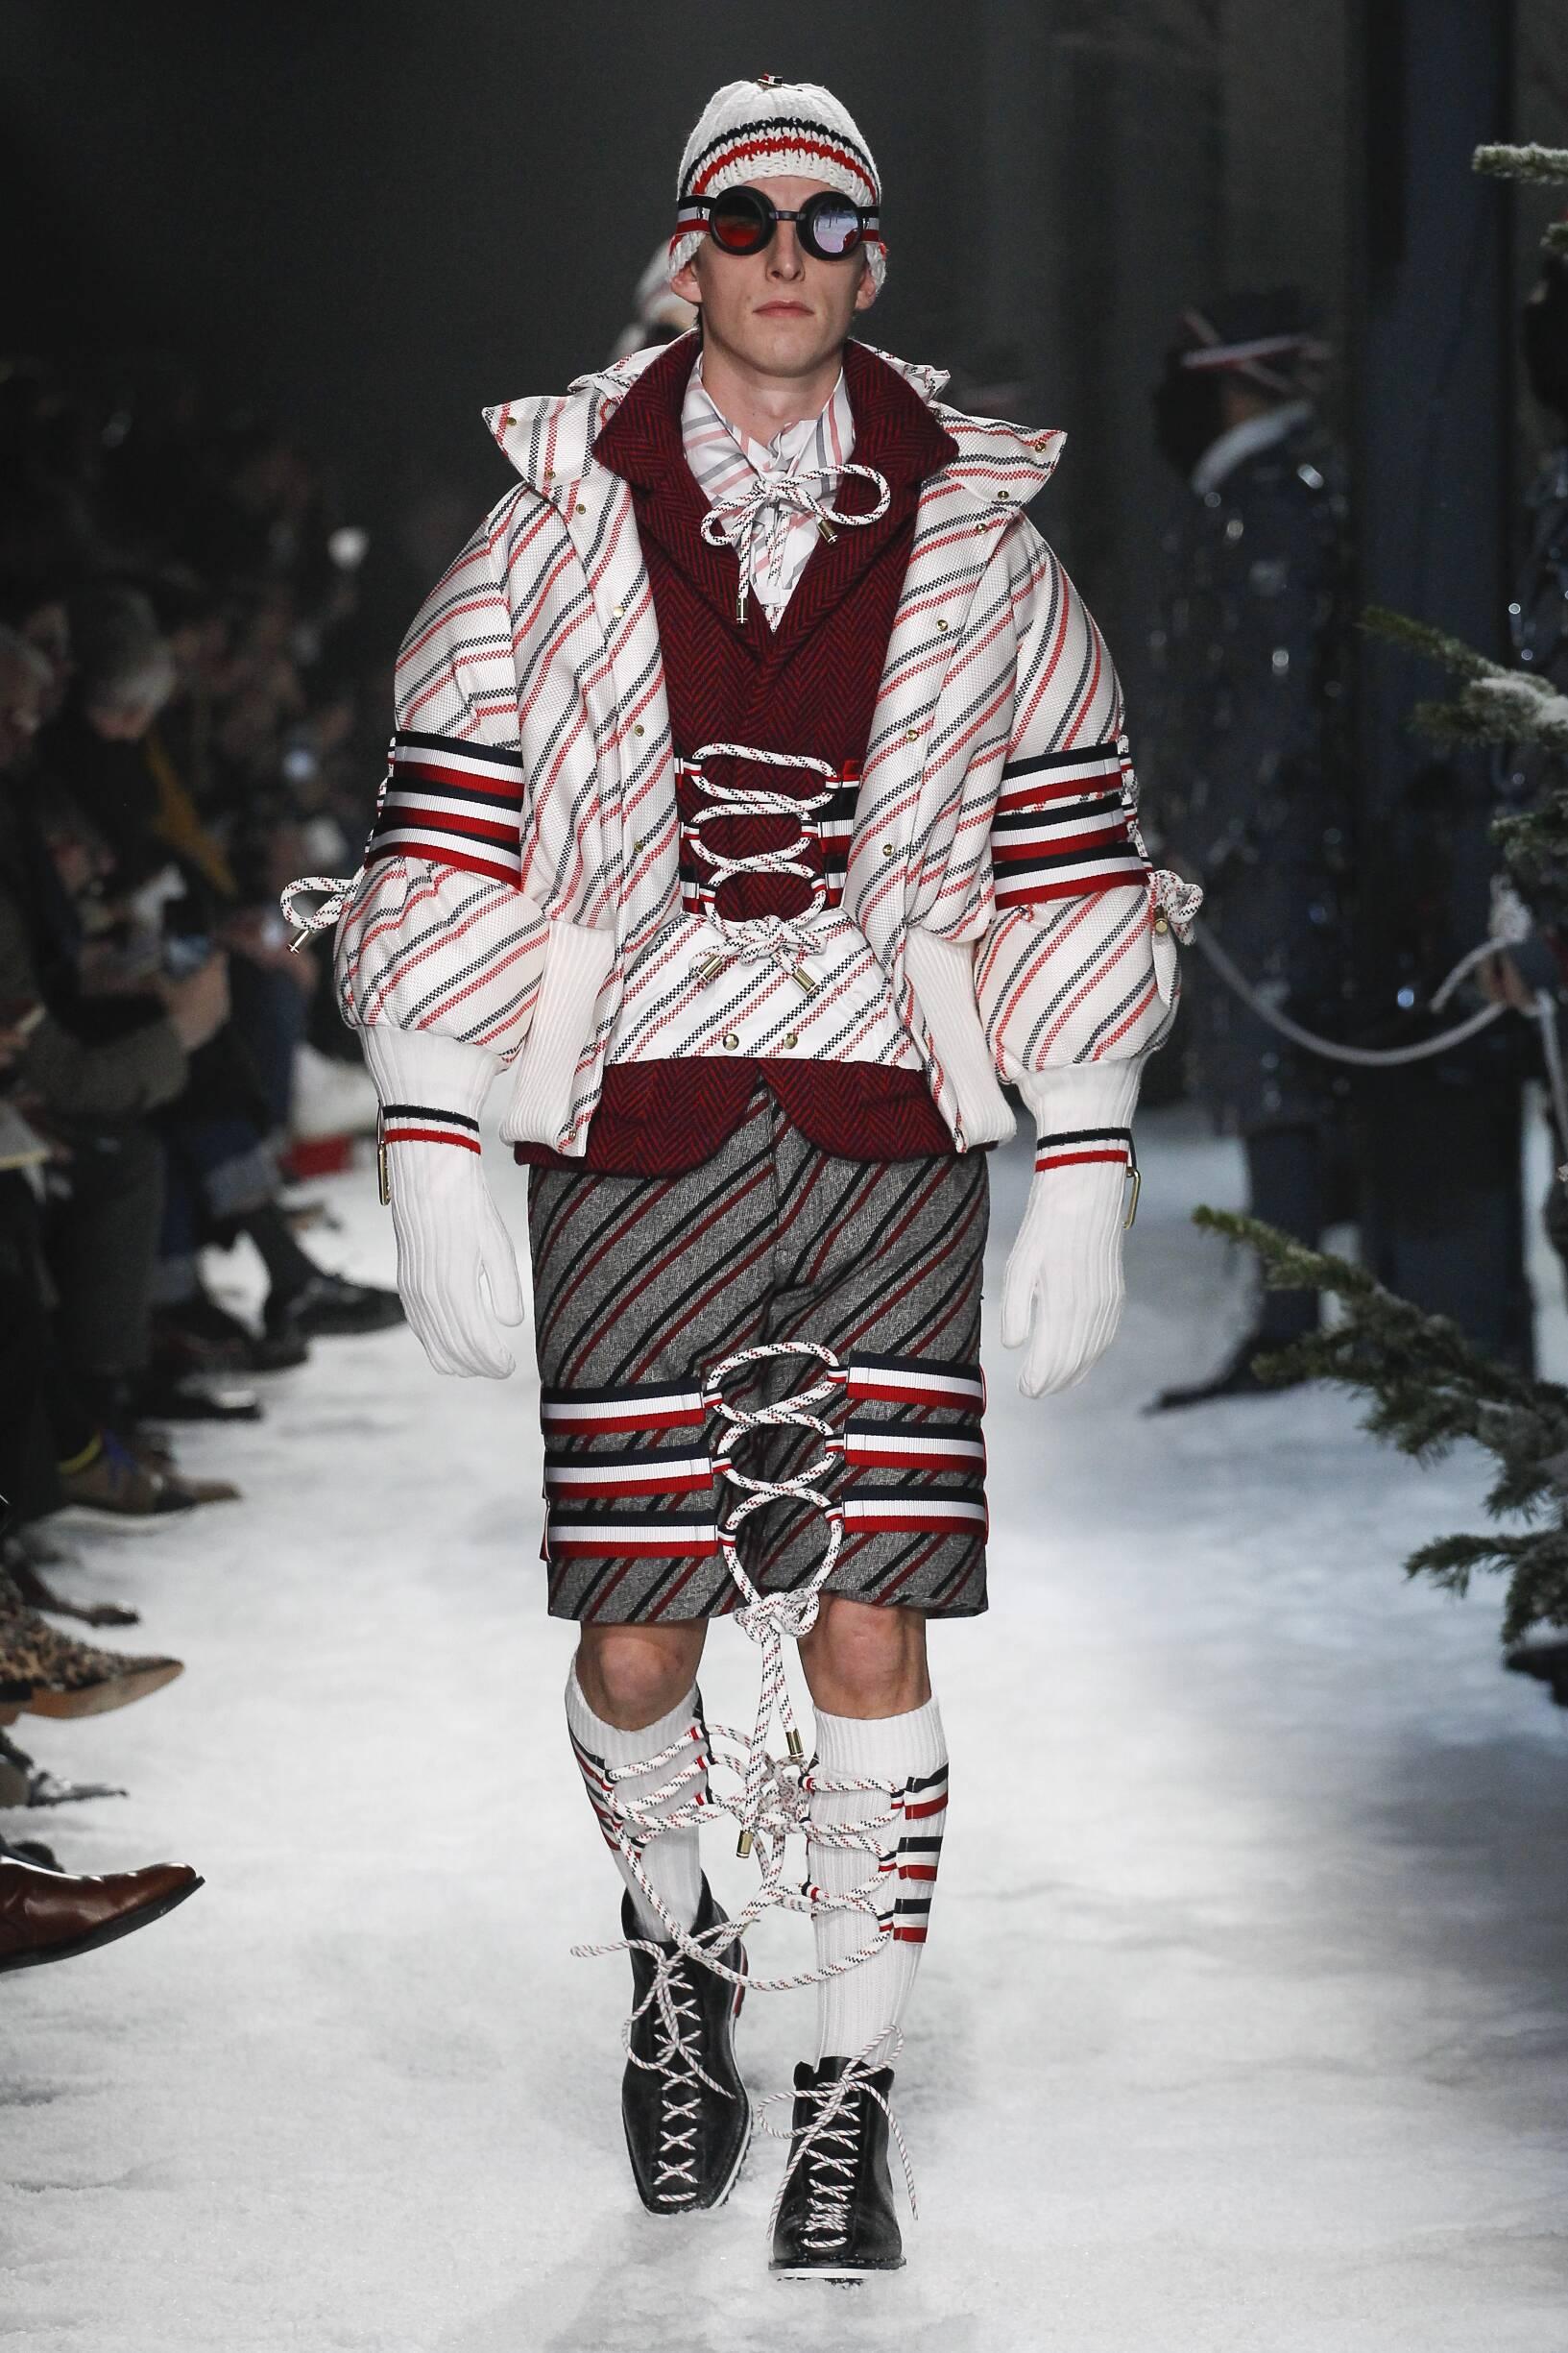 Winter 2017 Fashion Trends Moncler Gamme Bleu